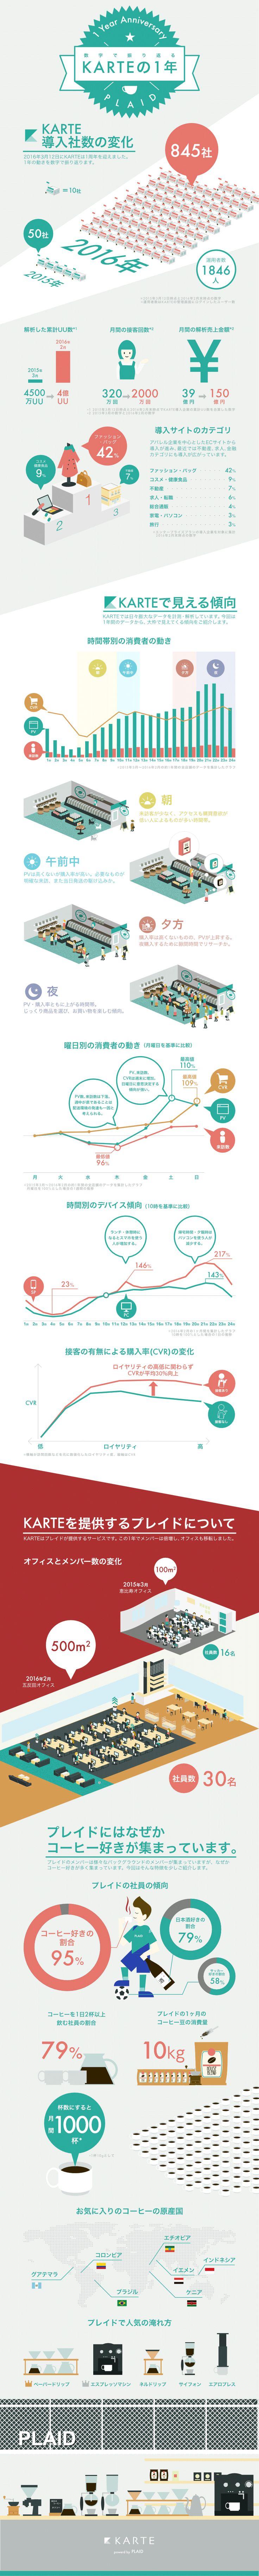 karte-infographic-101603